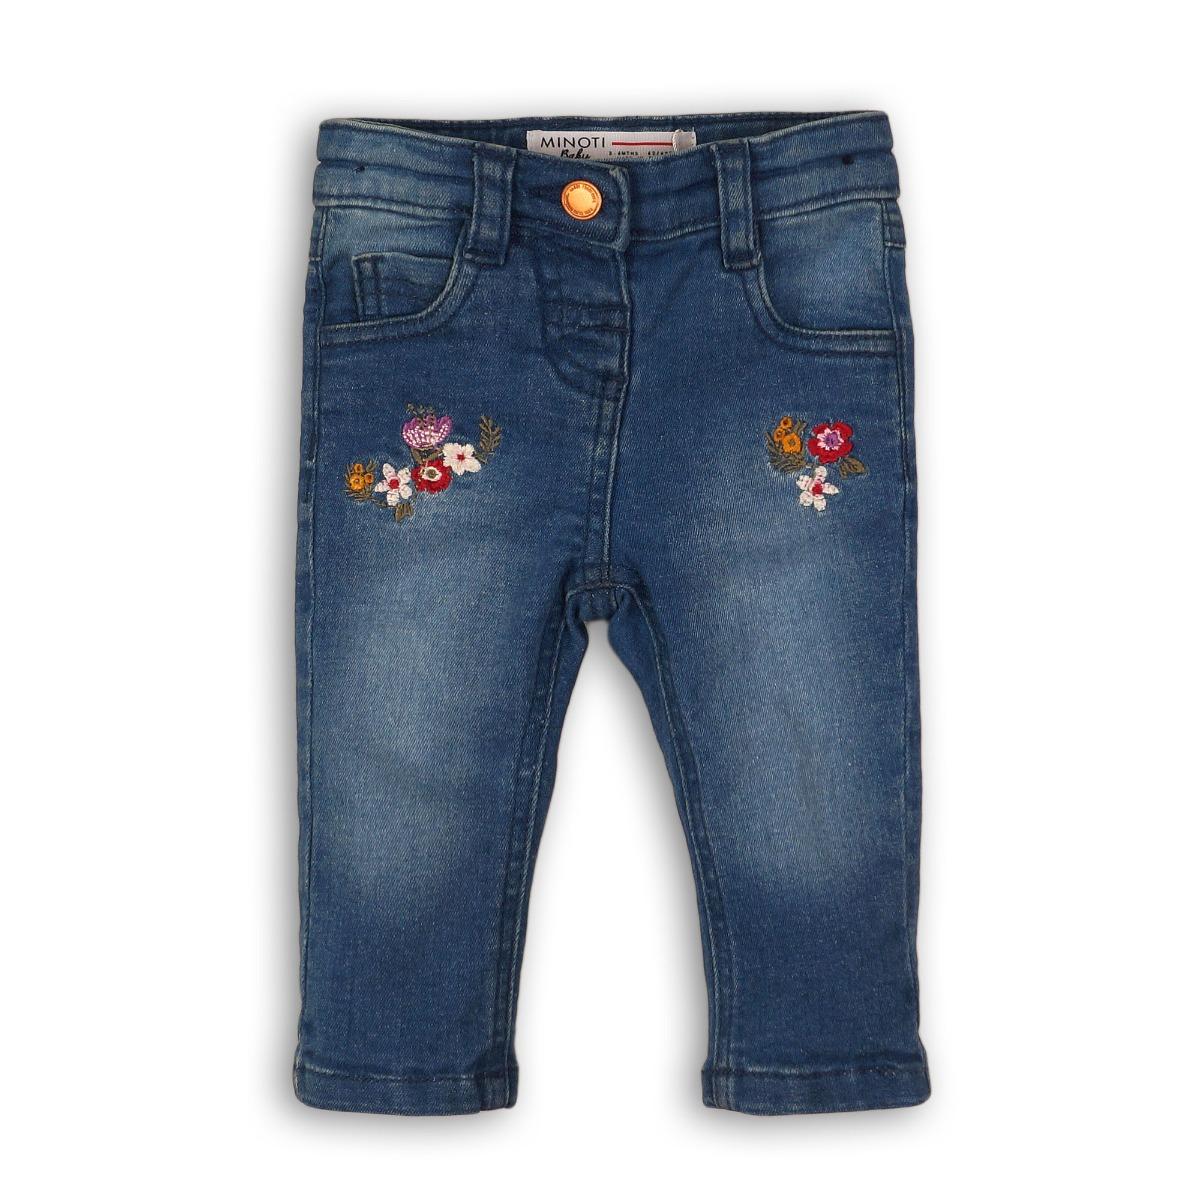 Pantaloni jeans skinny denim Minoti Deer